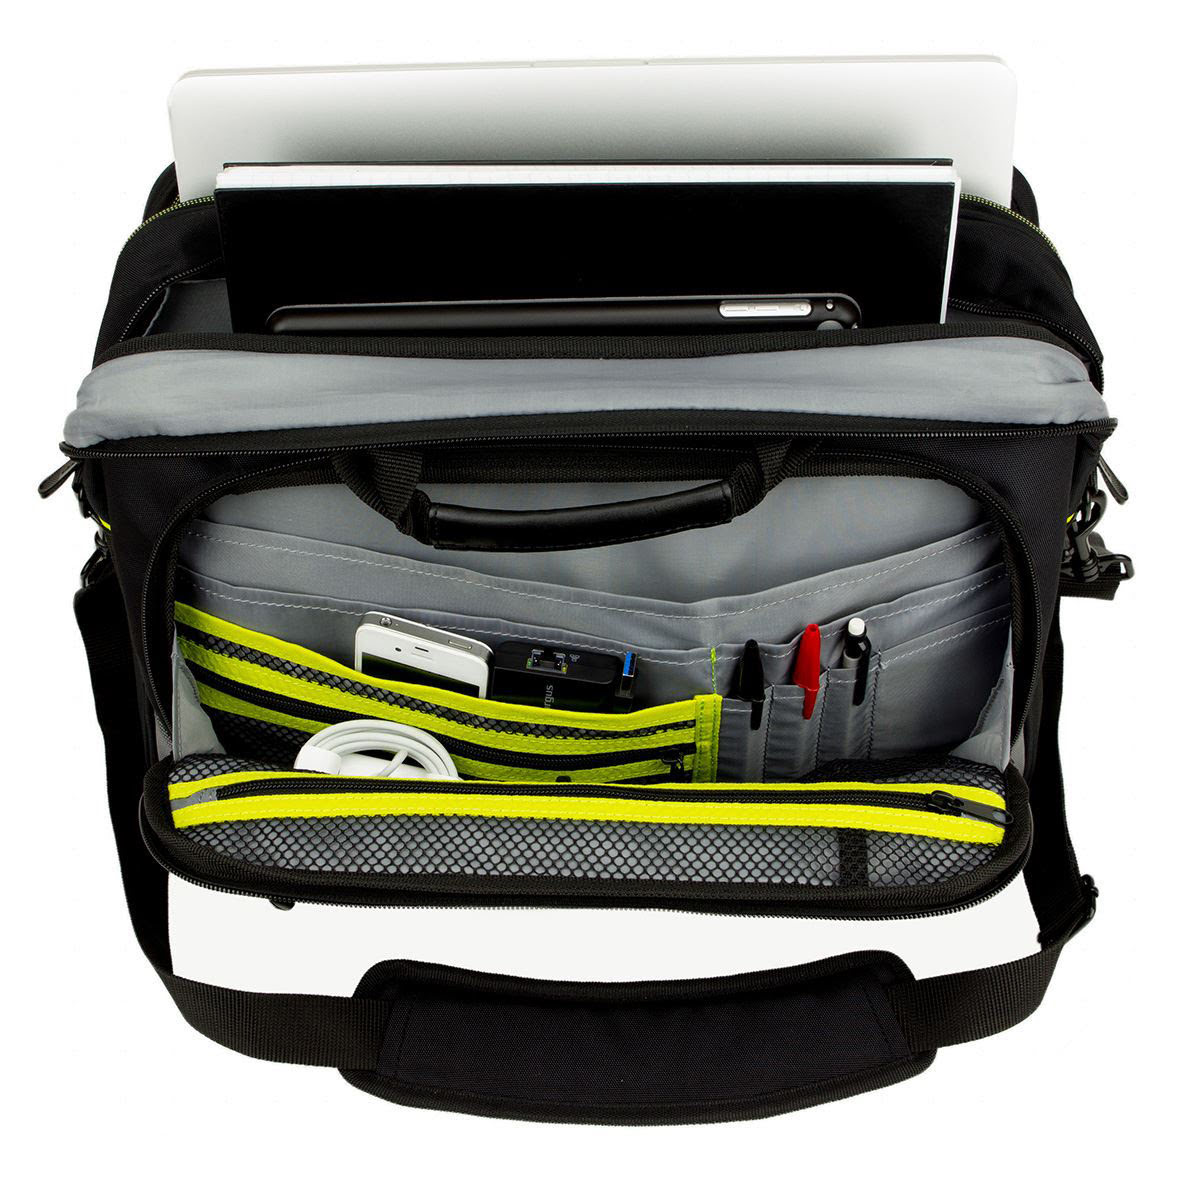 "TCG470EU CityGear 15-17.3"" Topload Laptop Case Targus - 2"